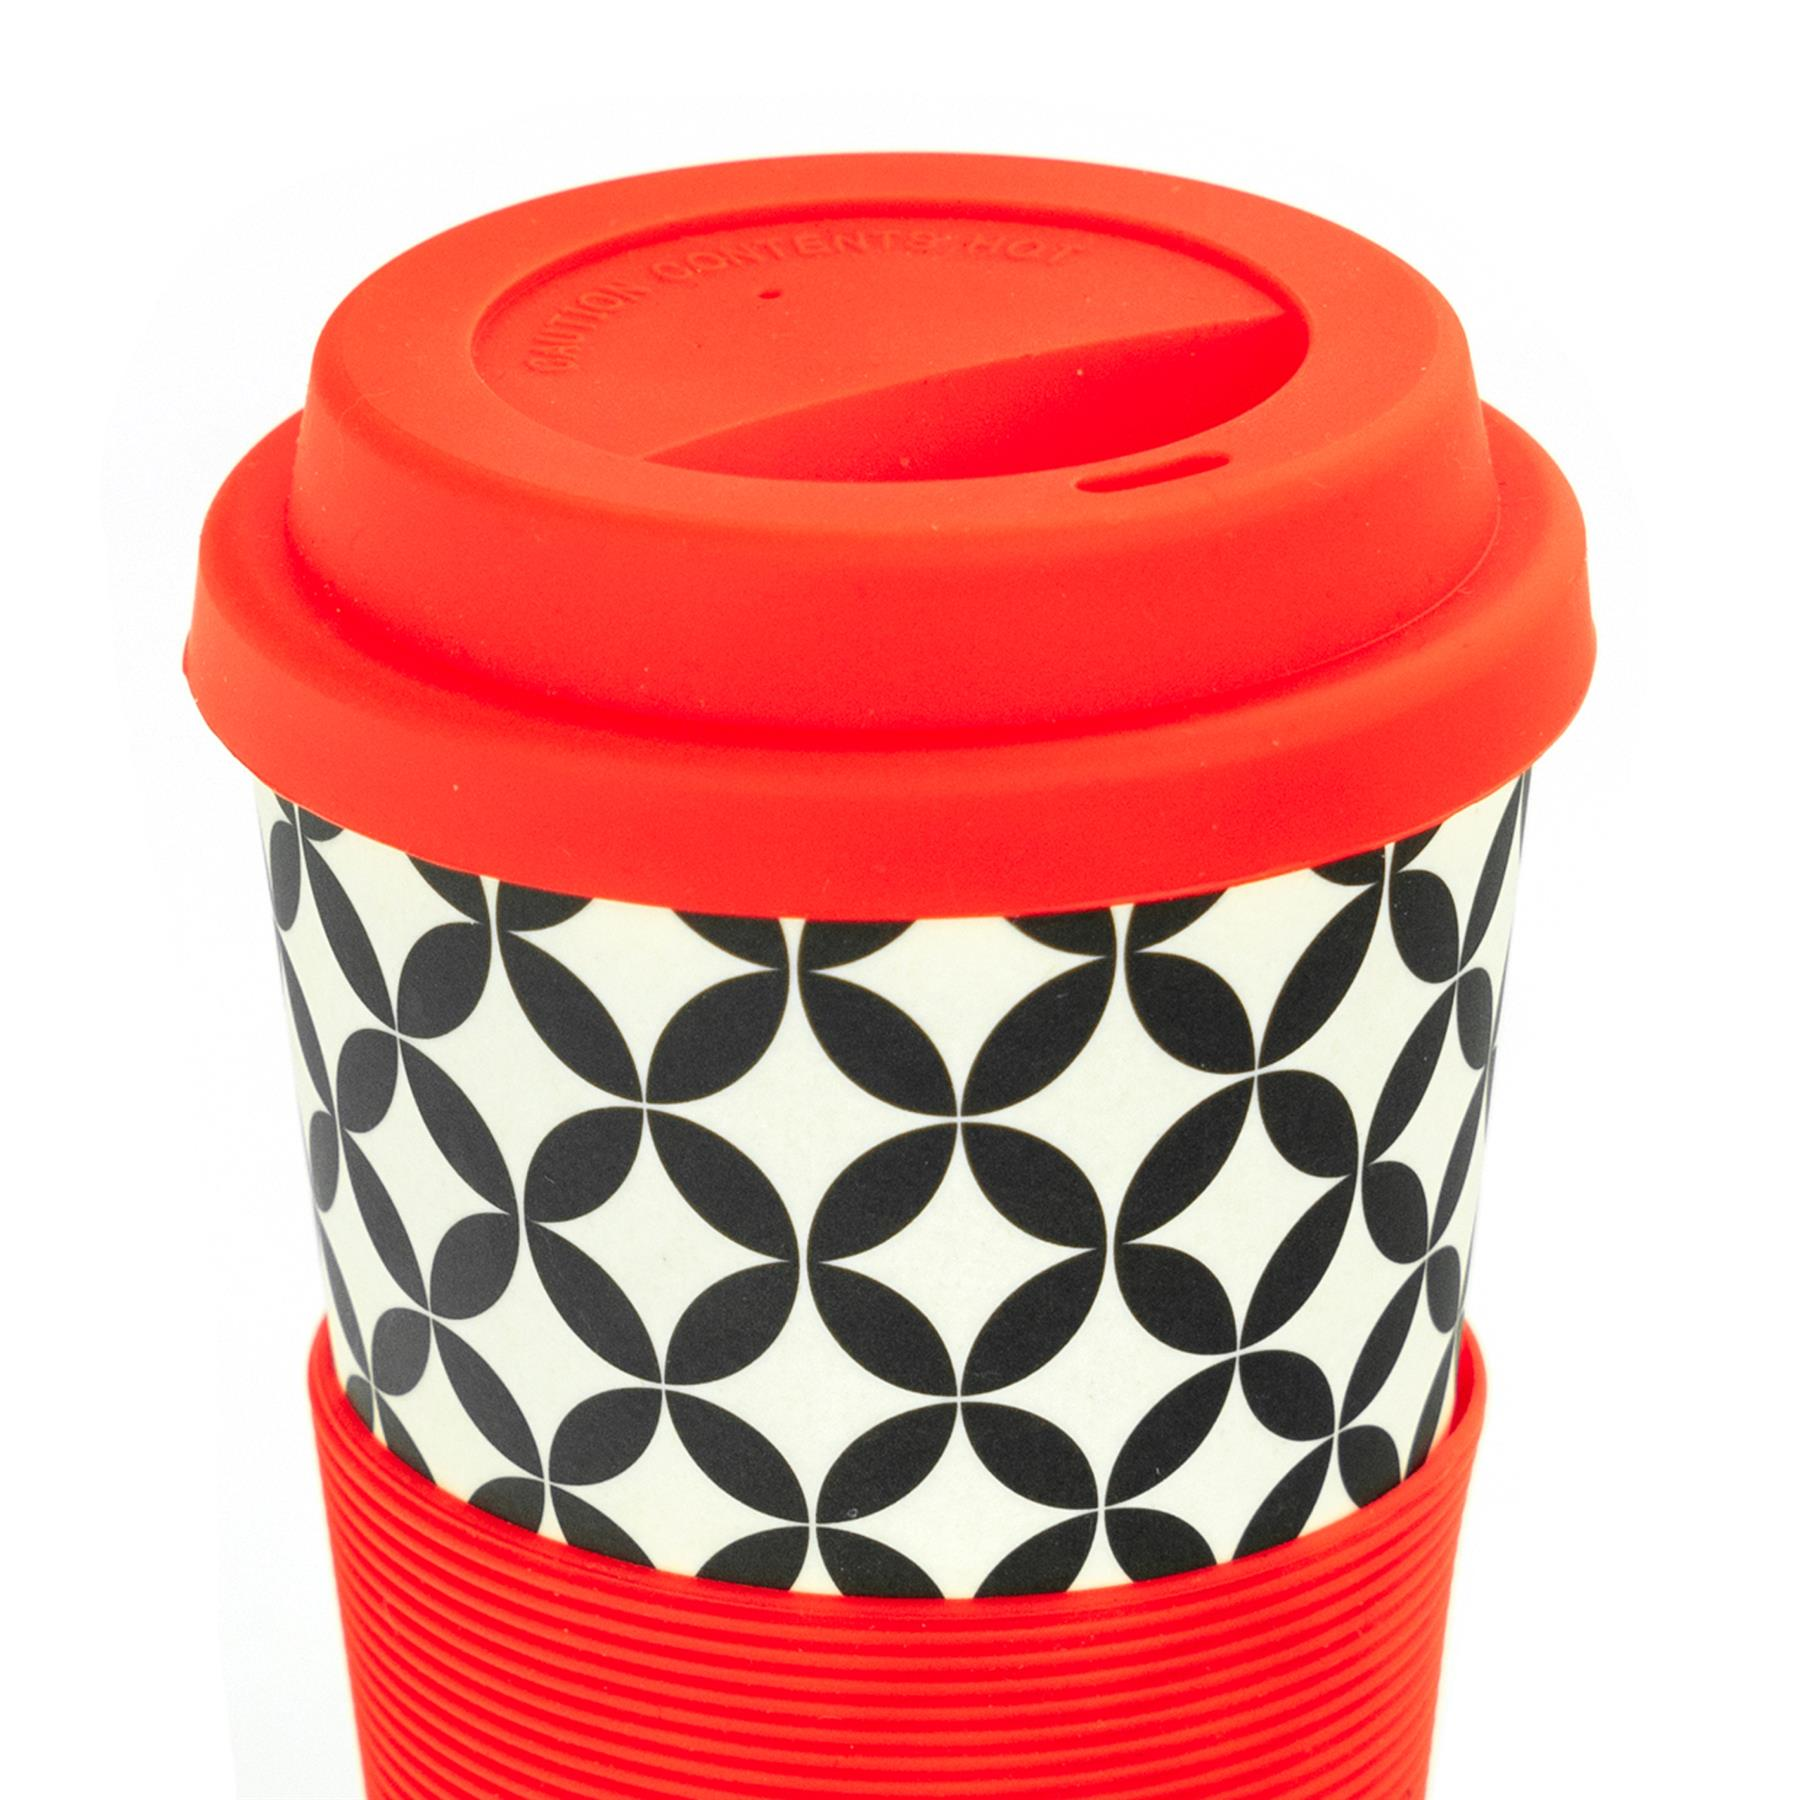 Reutilizable Taza De Café Taza de viaje Eco Friendly fibra de bambú 400ml-Conjunto de 3